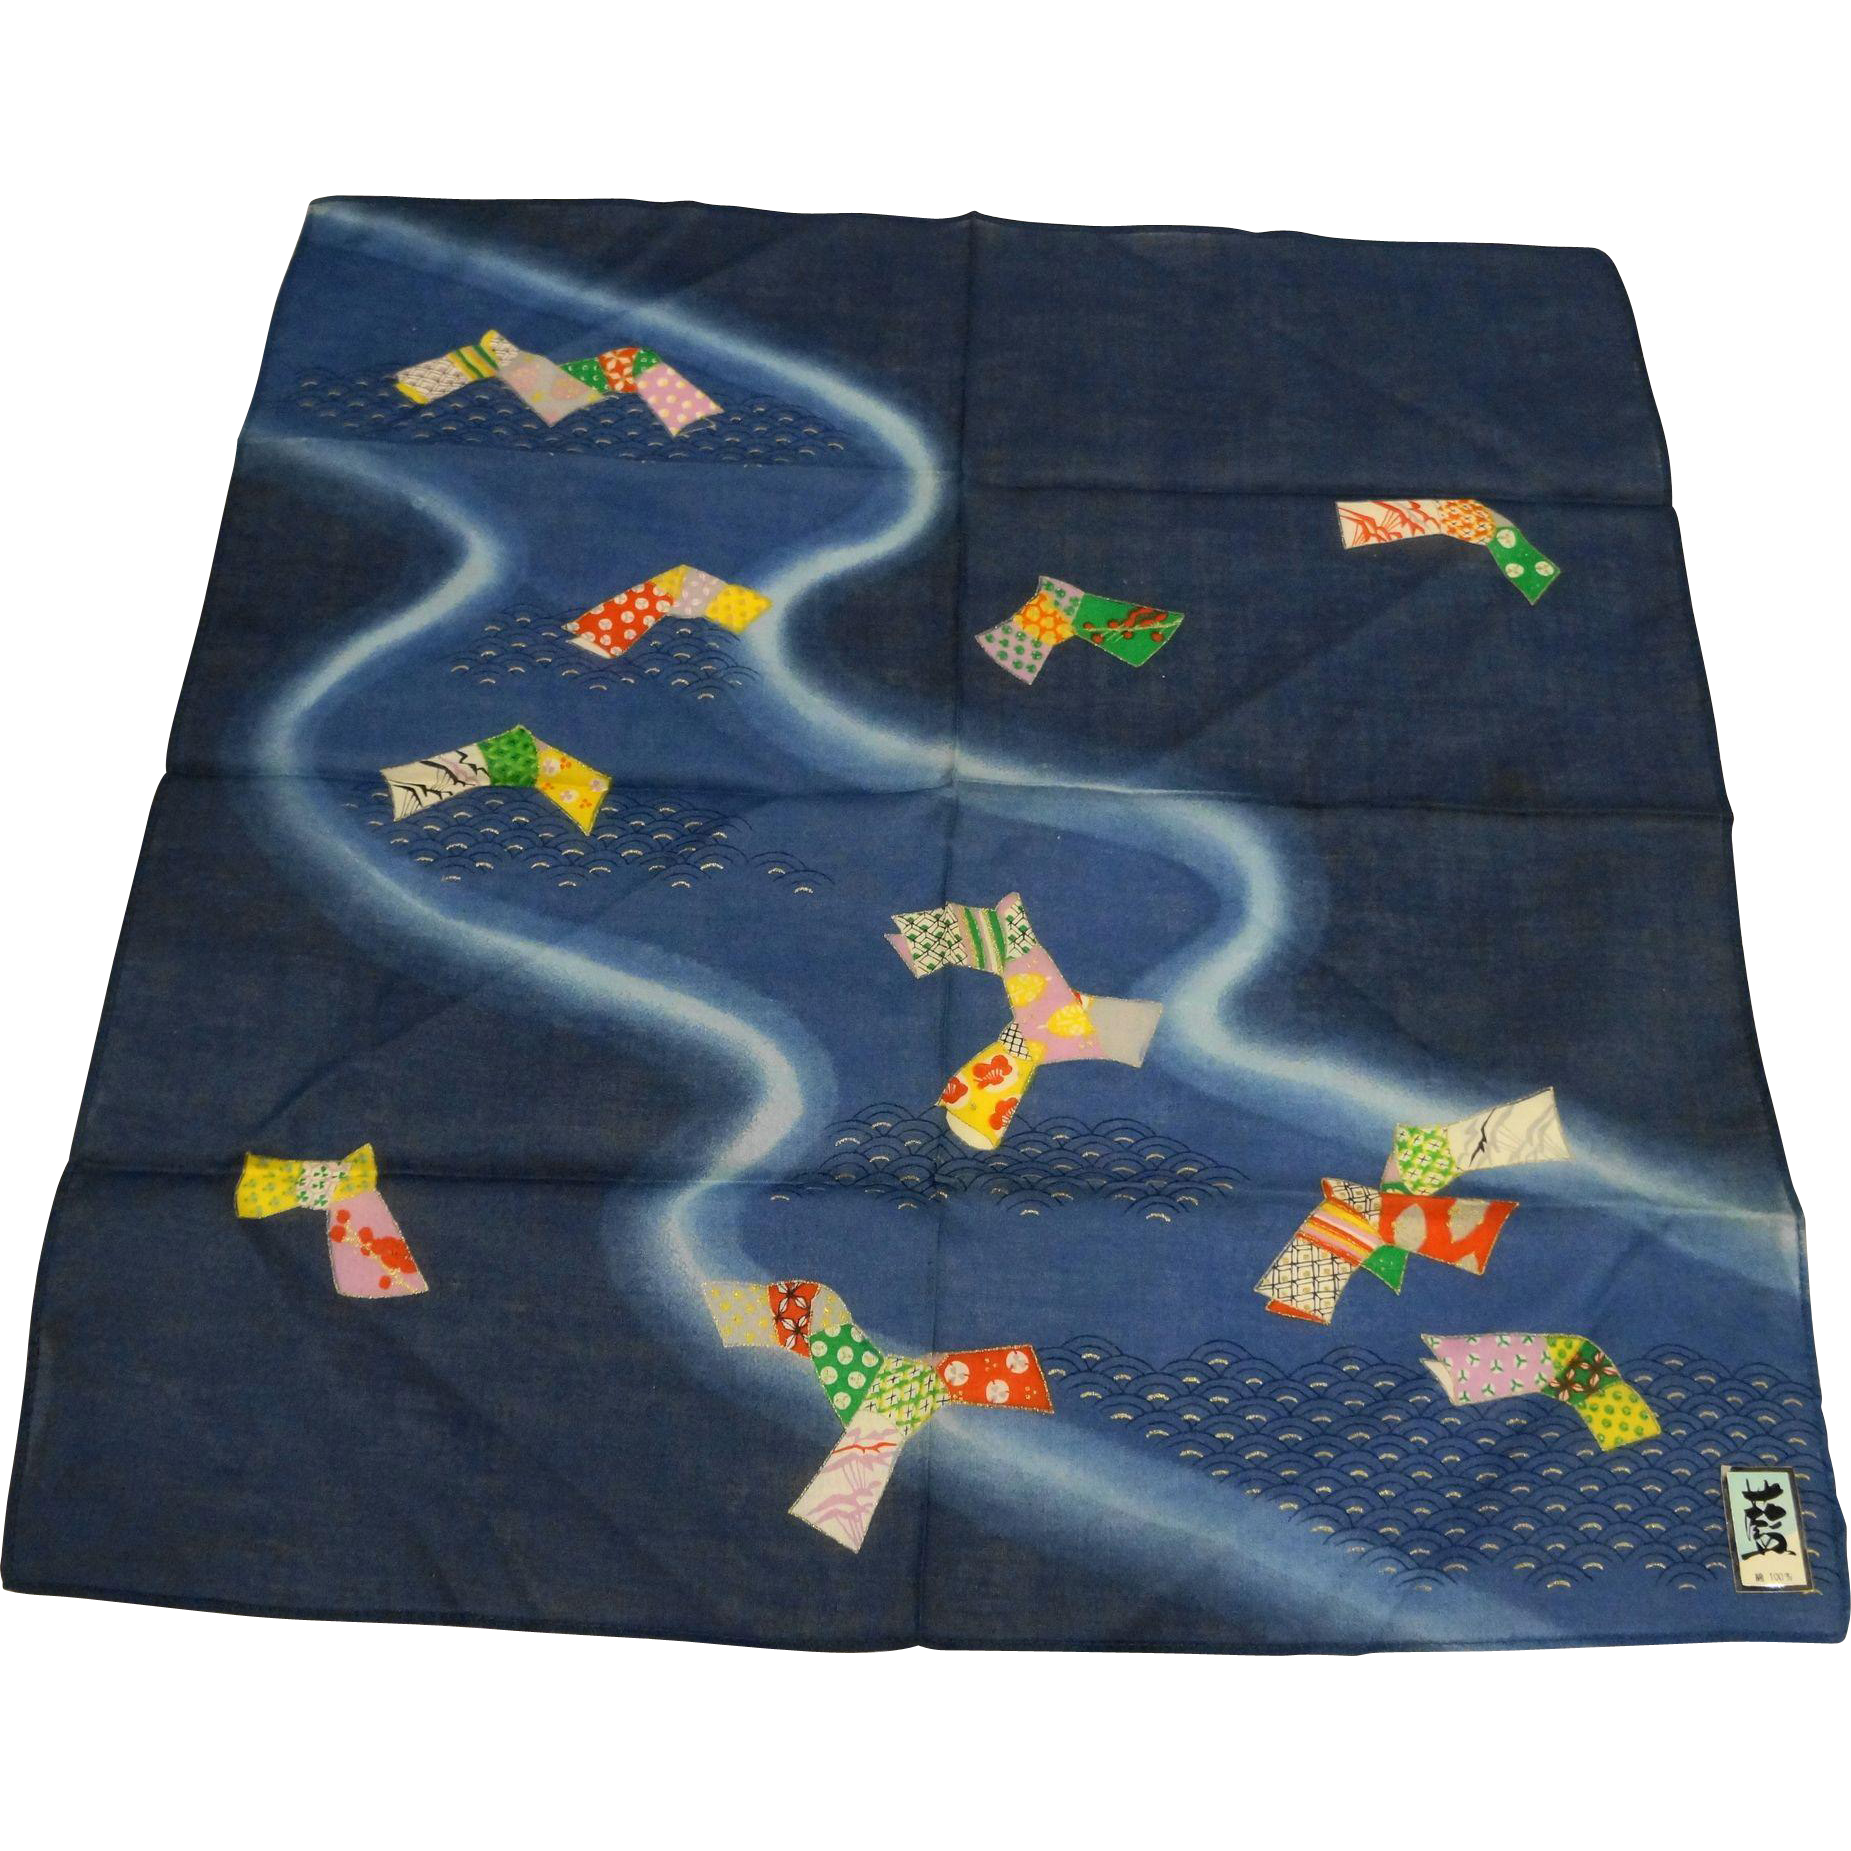 Japanese Kite Print Dark Blue Cotton Handkerchief New Condition